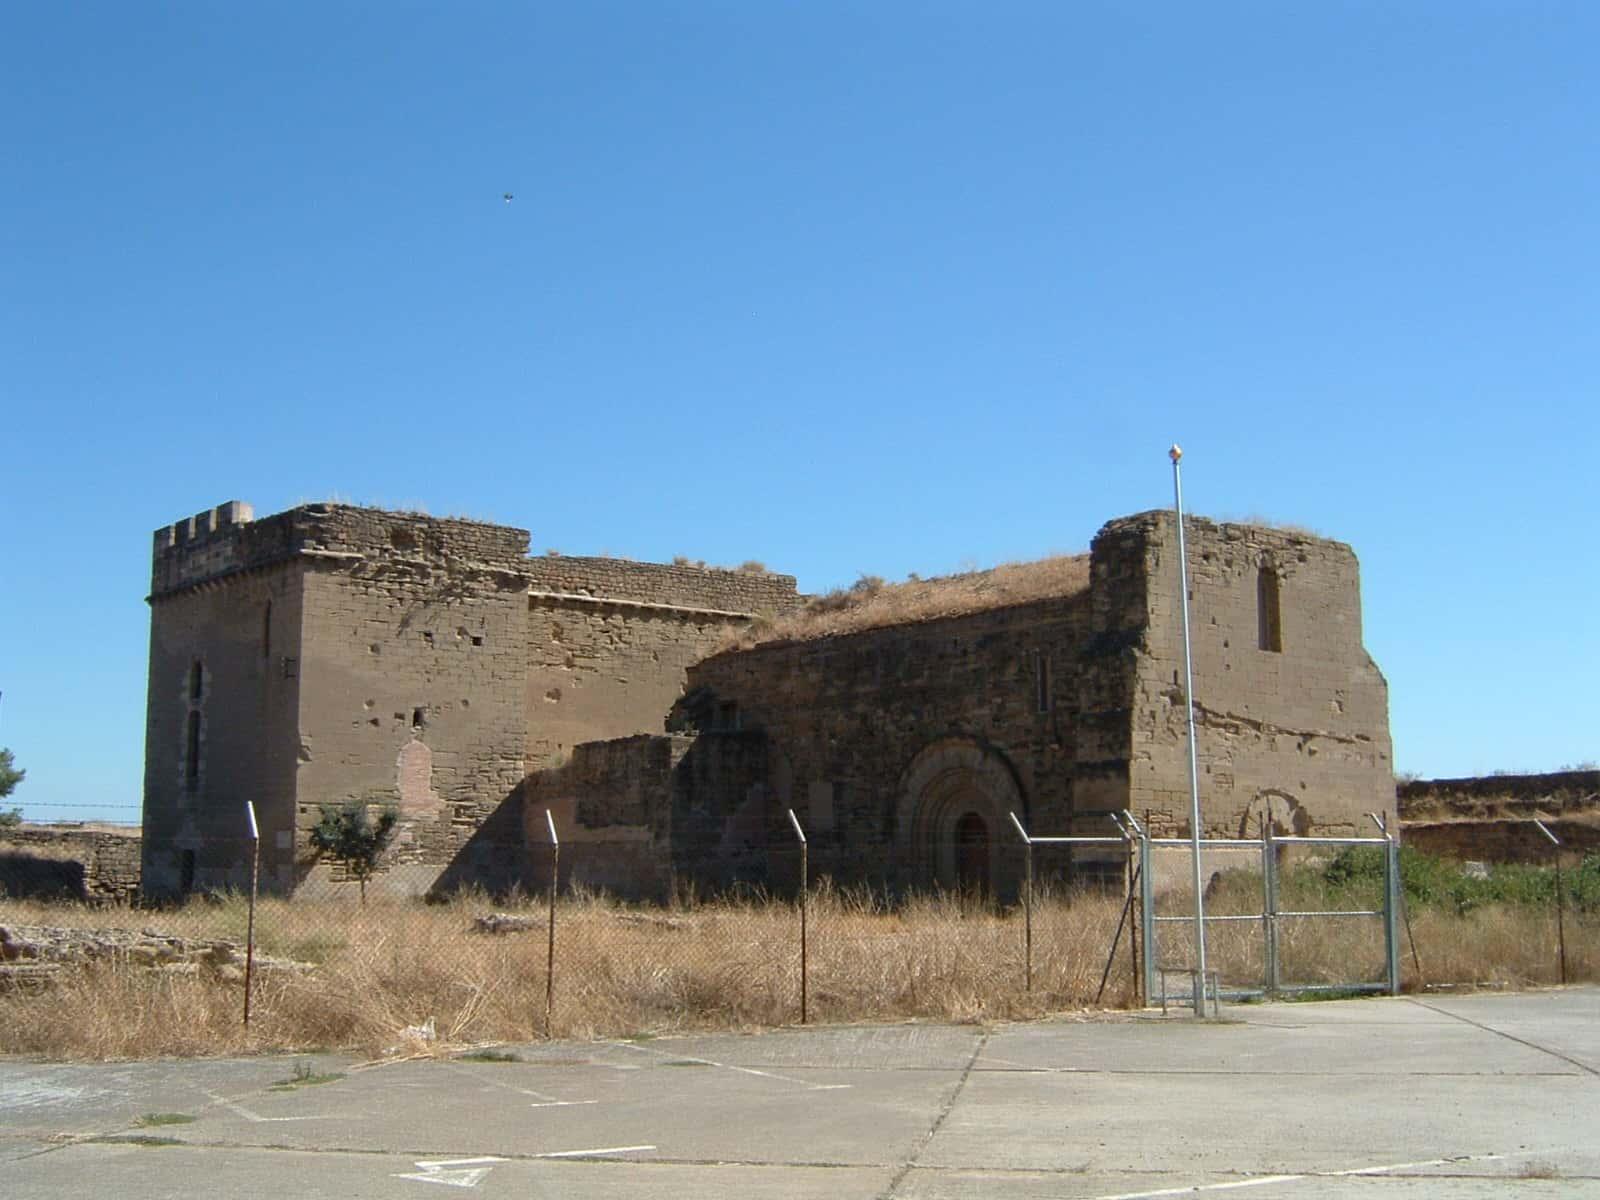 Le fort Garden